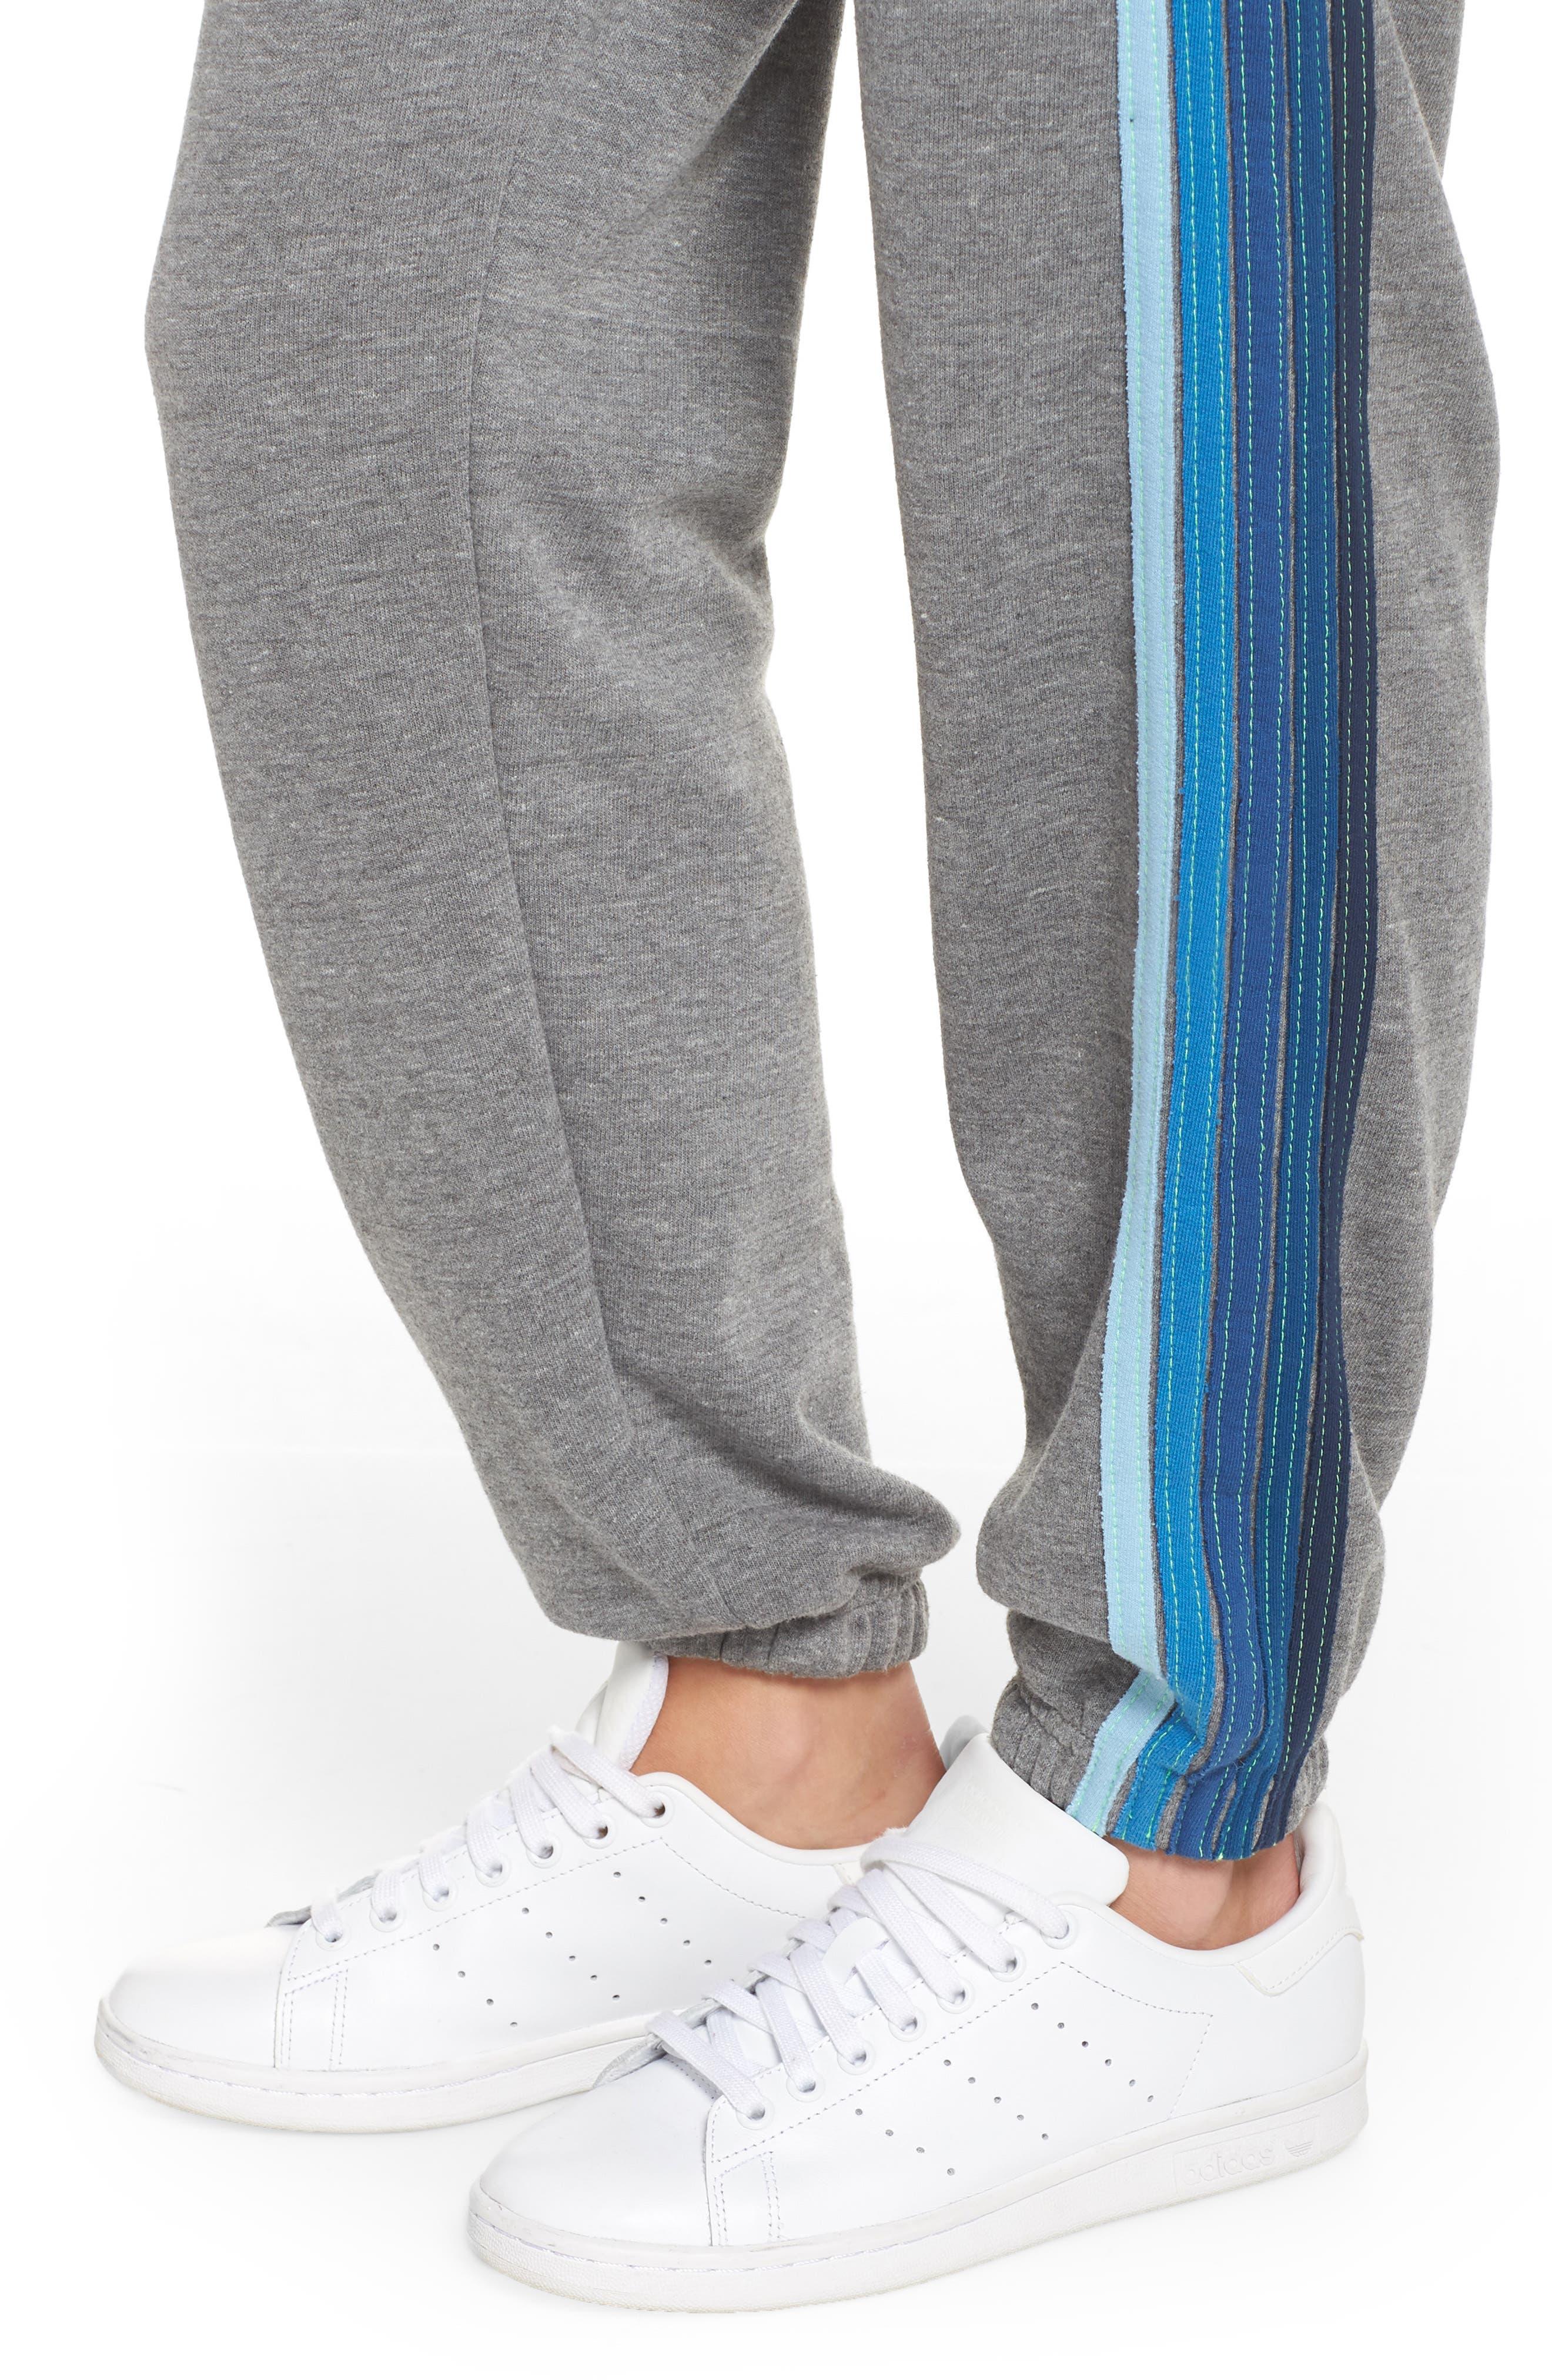 Stripe Sweatpants,                             Alternate thumbnail 7, color,                             Heather Grey/ Blue Stripes